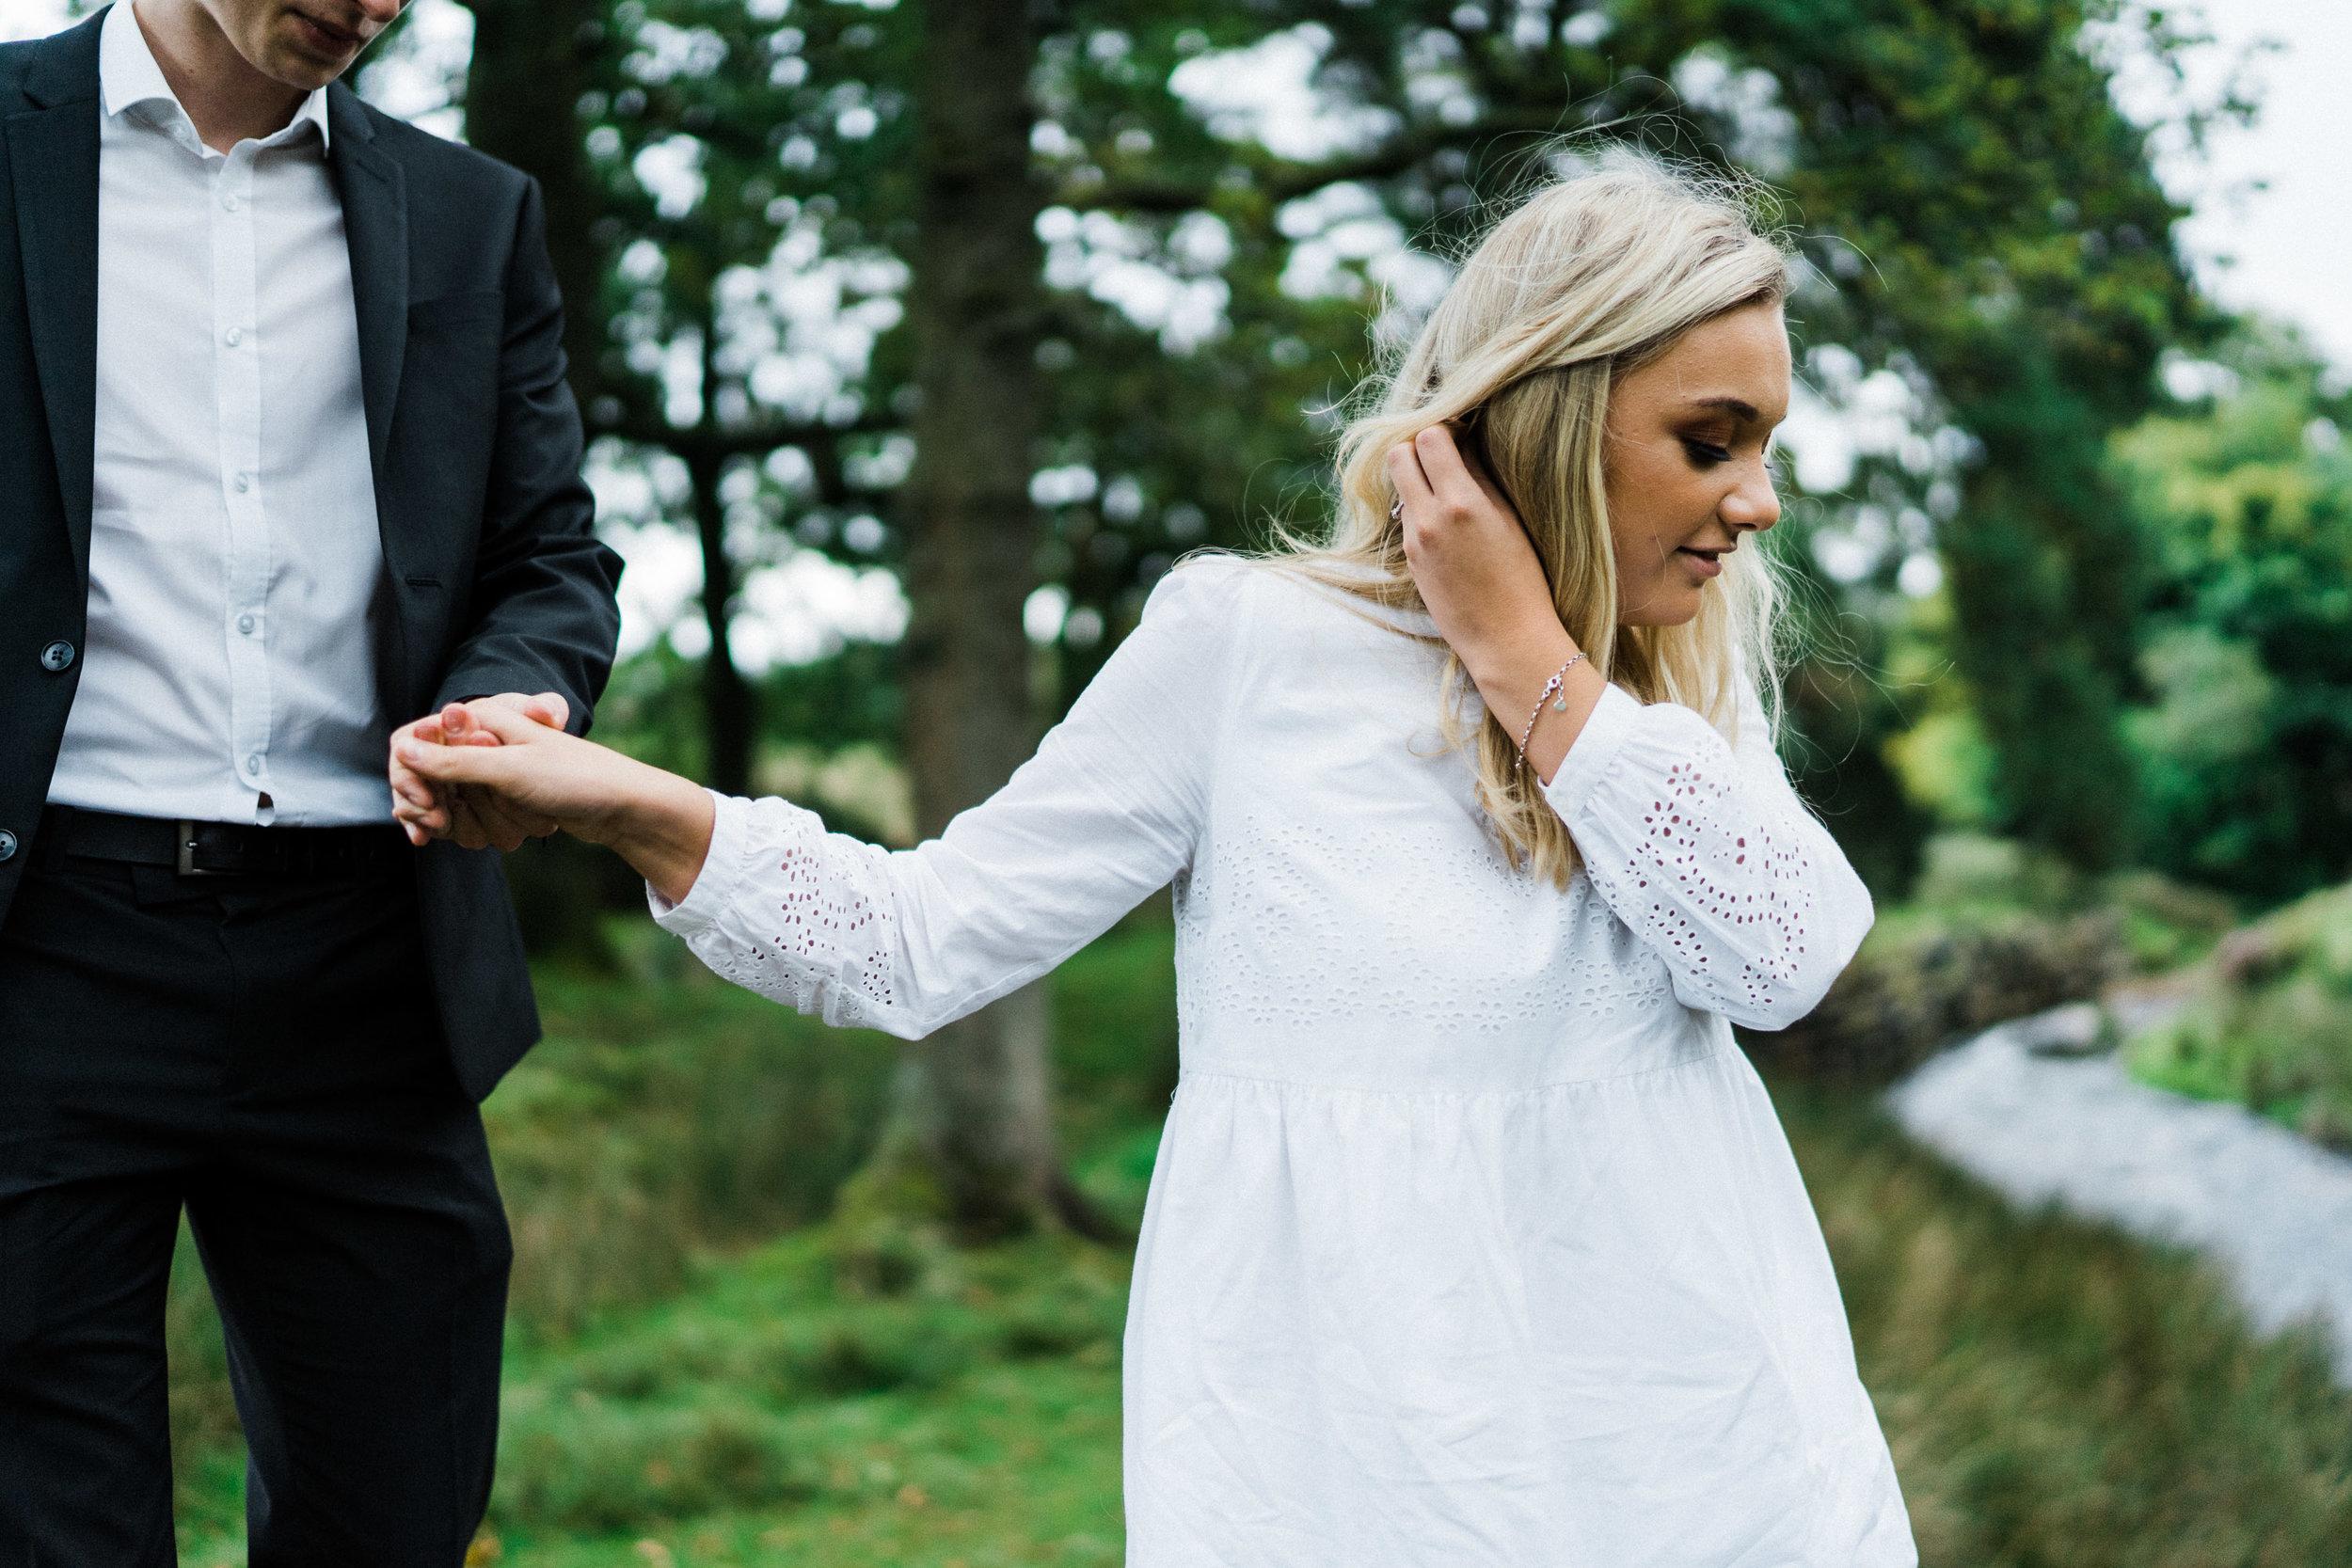 www.bytomw.com - Tom Wright - Manchester & Lake District Wedding Photographer -01050.jpg